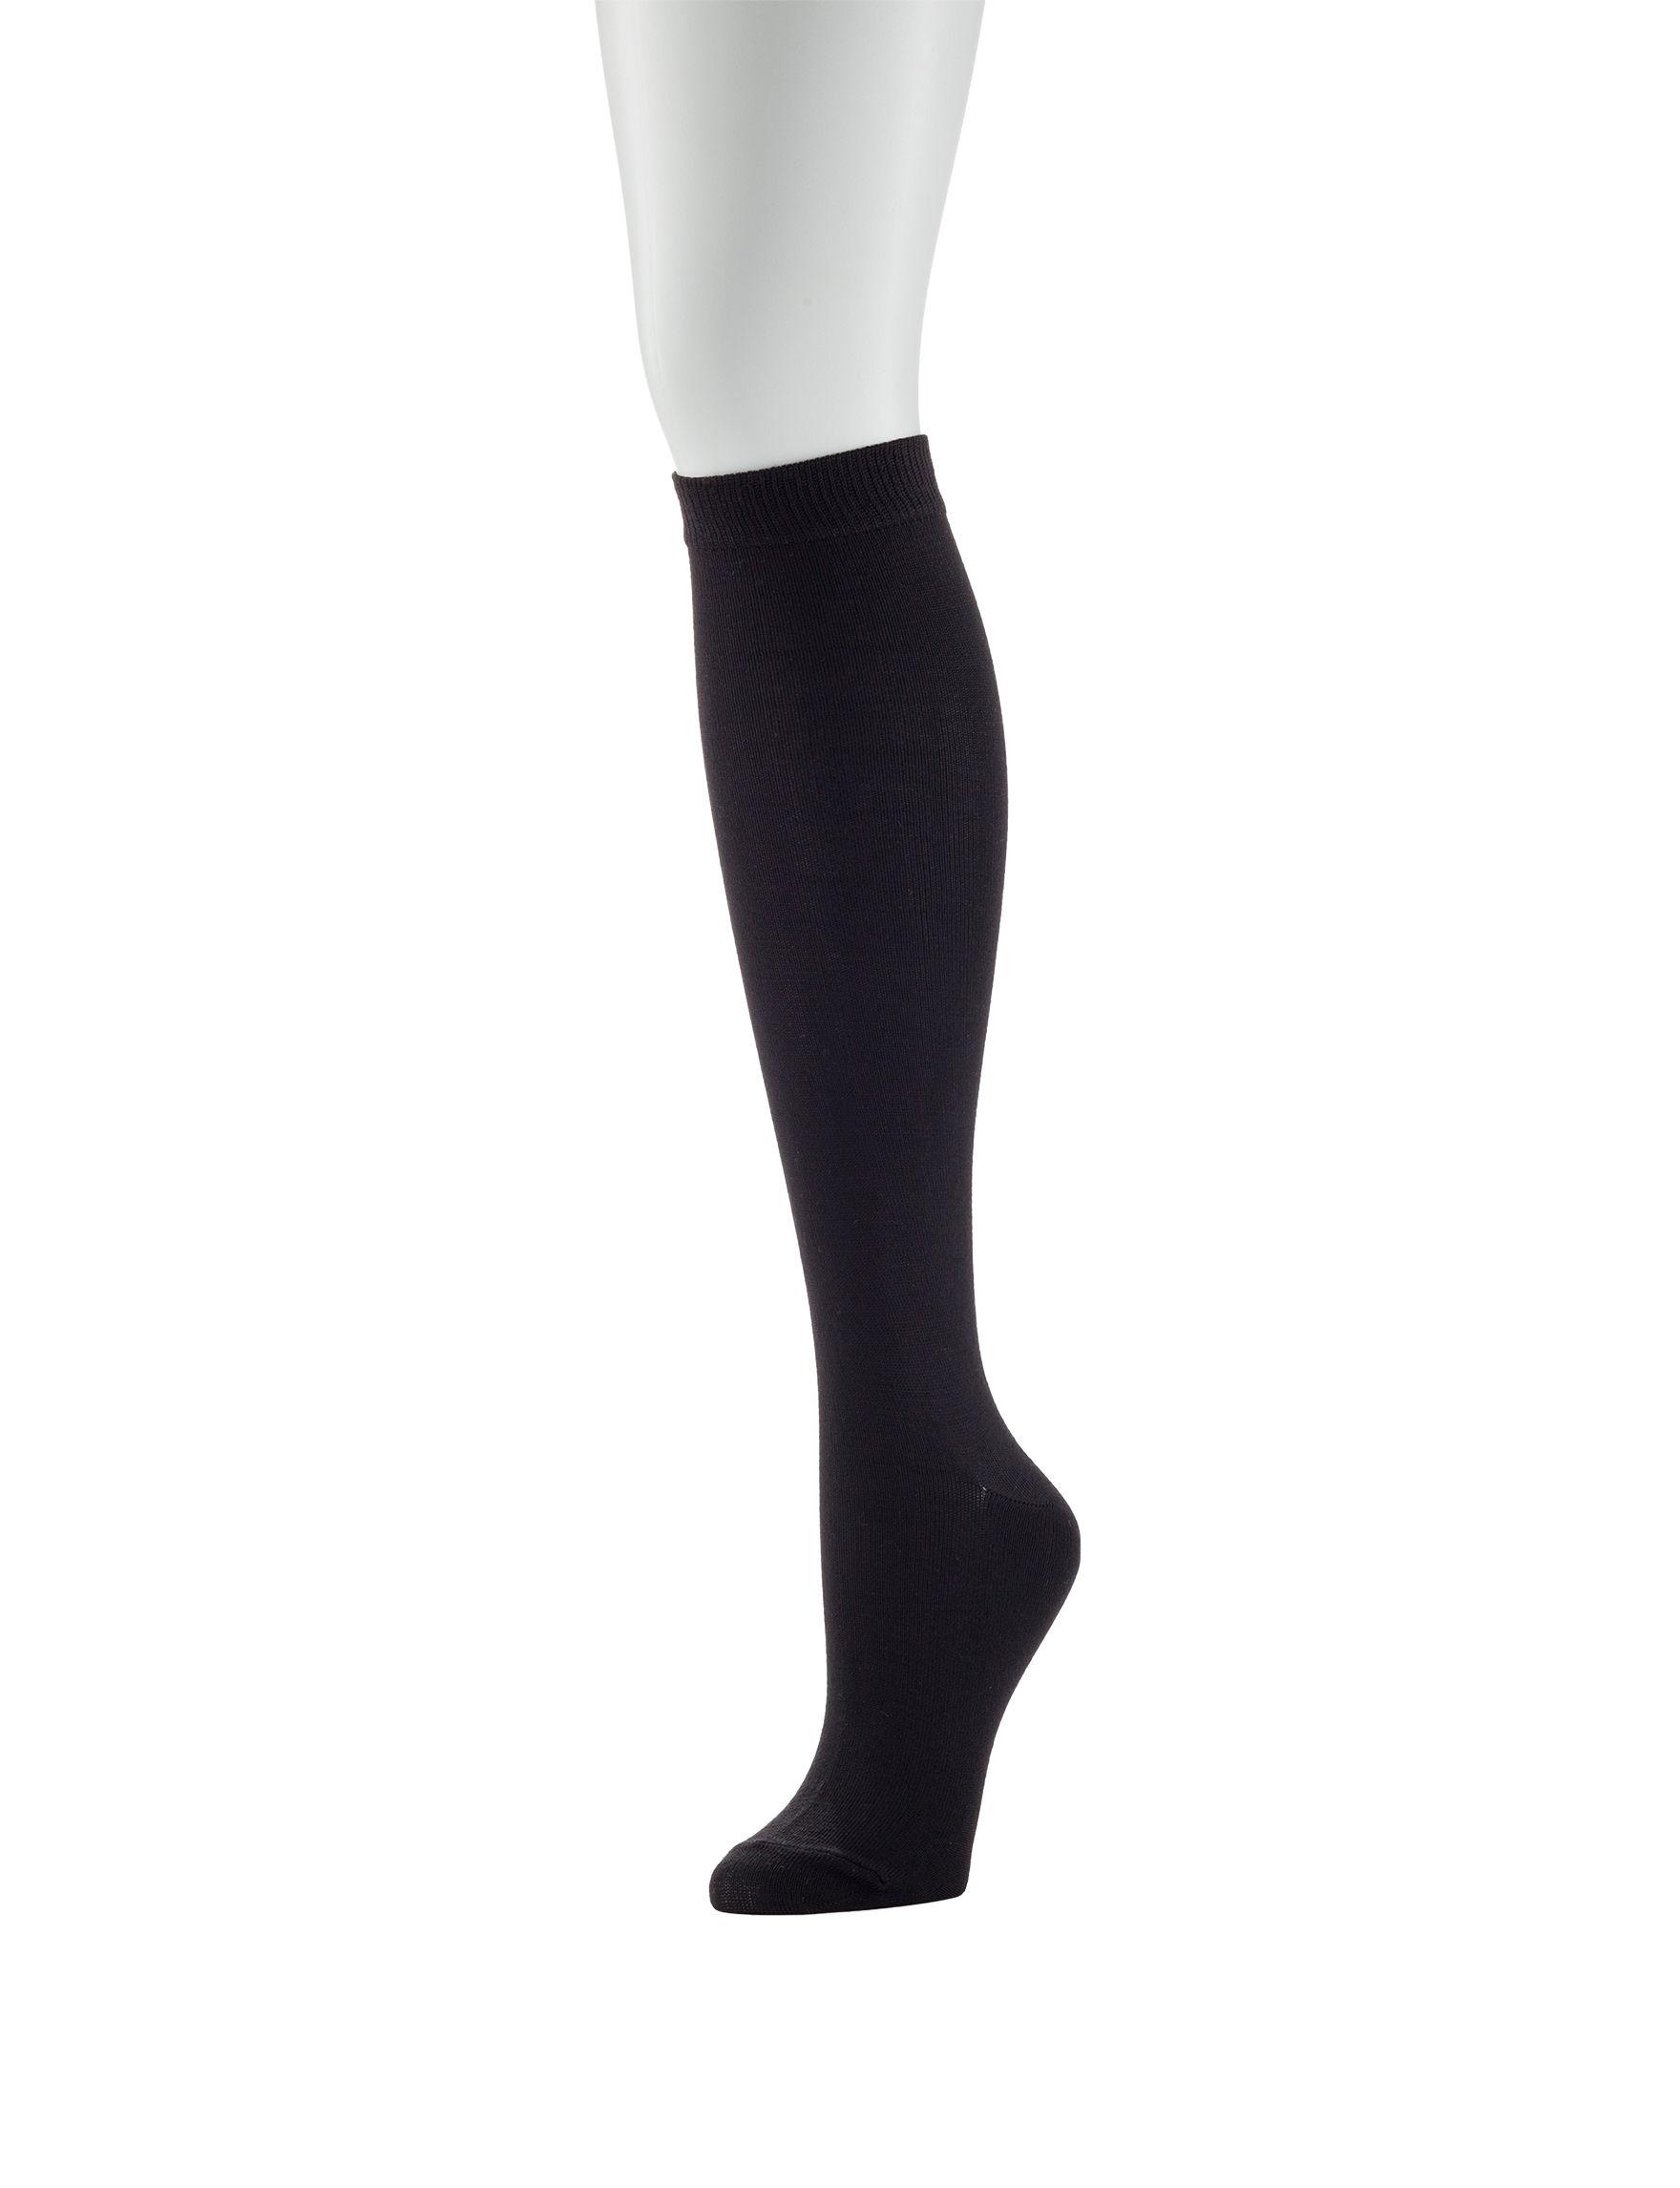 Hanes Black Socks